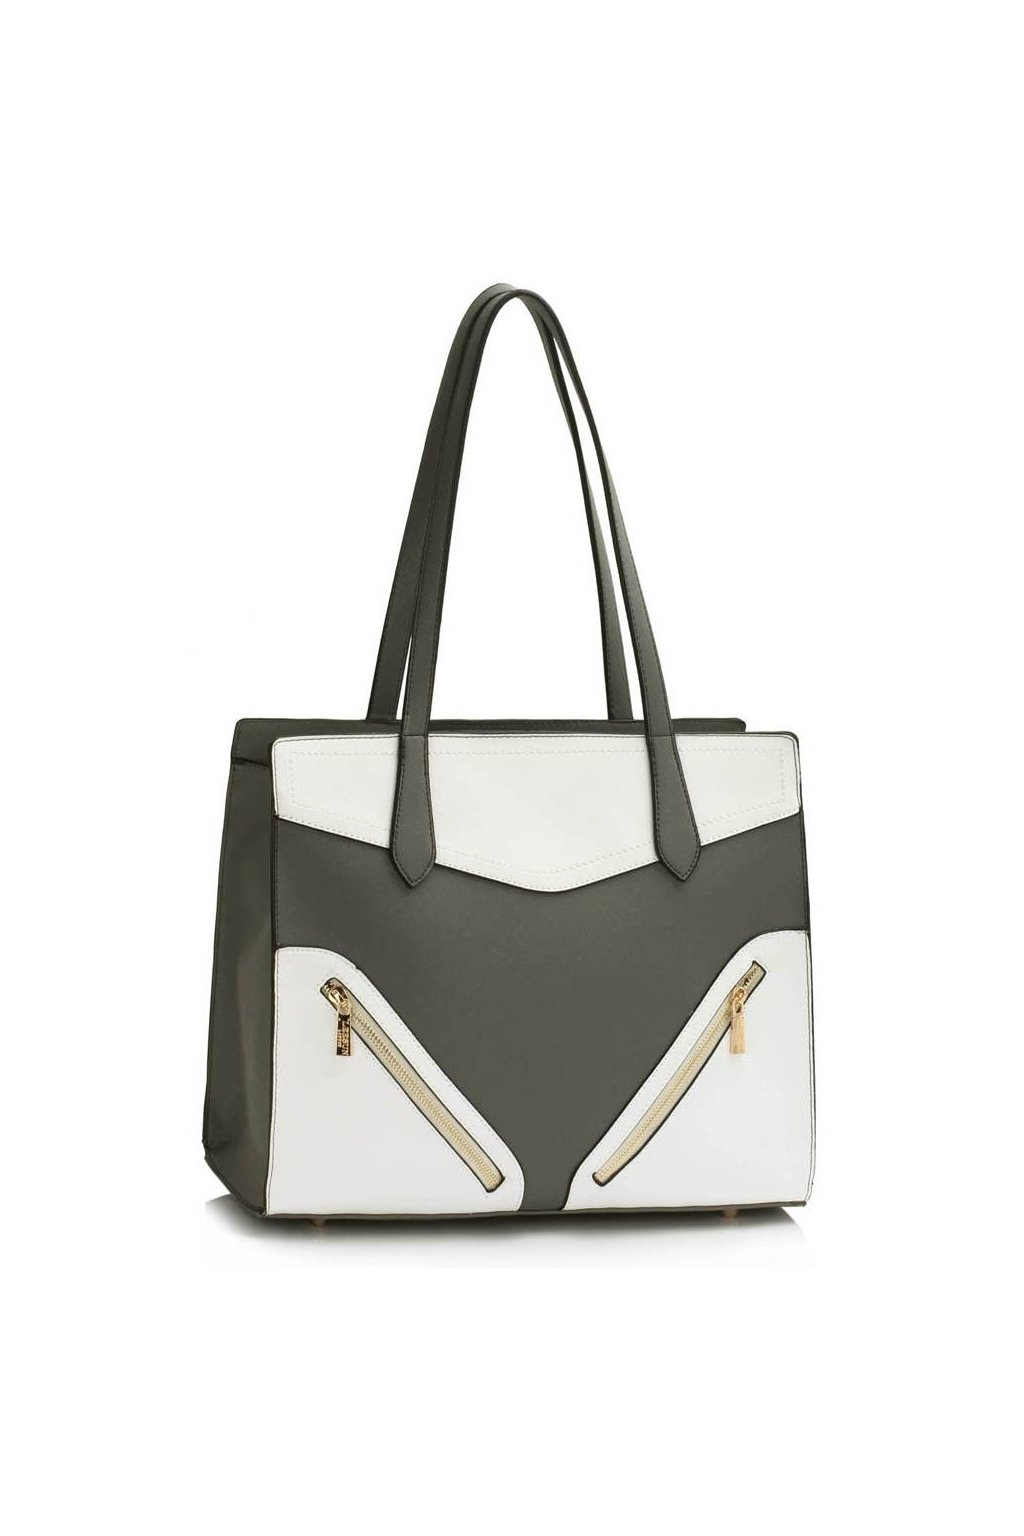 Sivo - biela kabelka na rameno Camille 29553a46b49